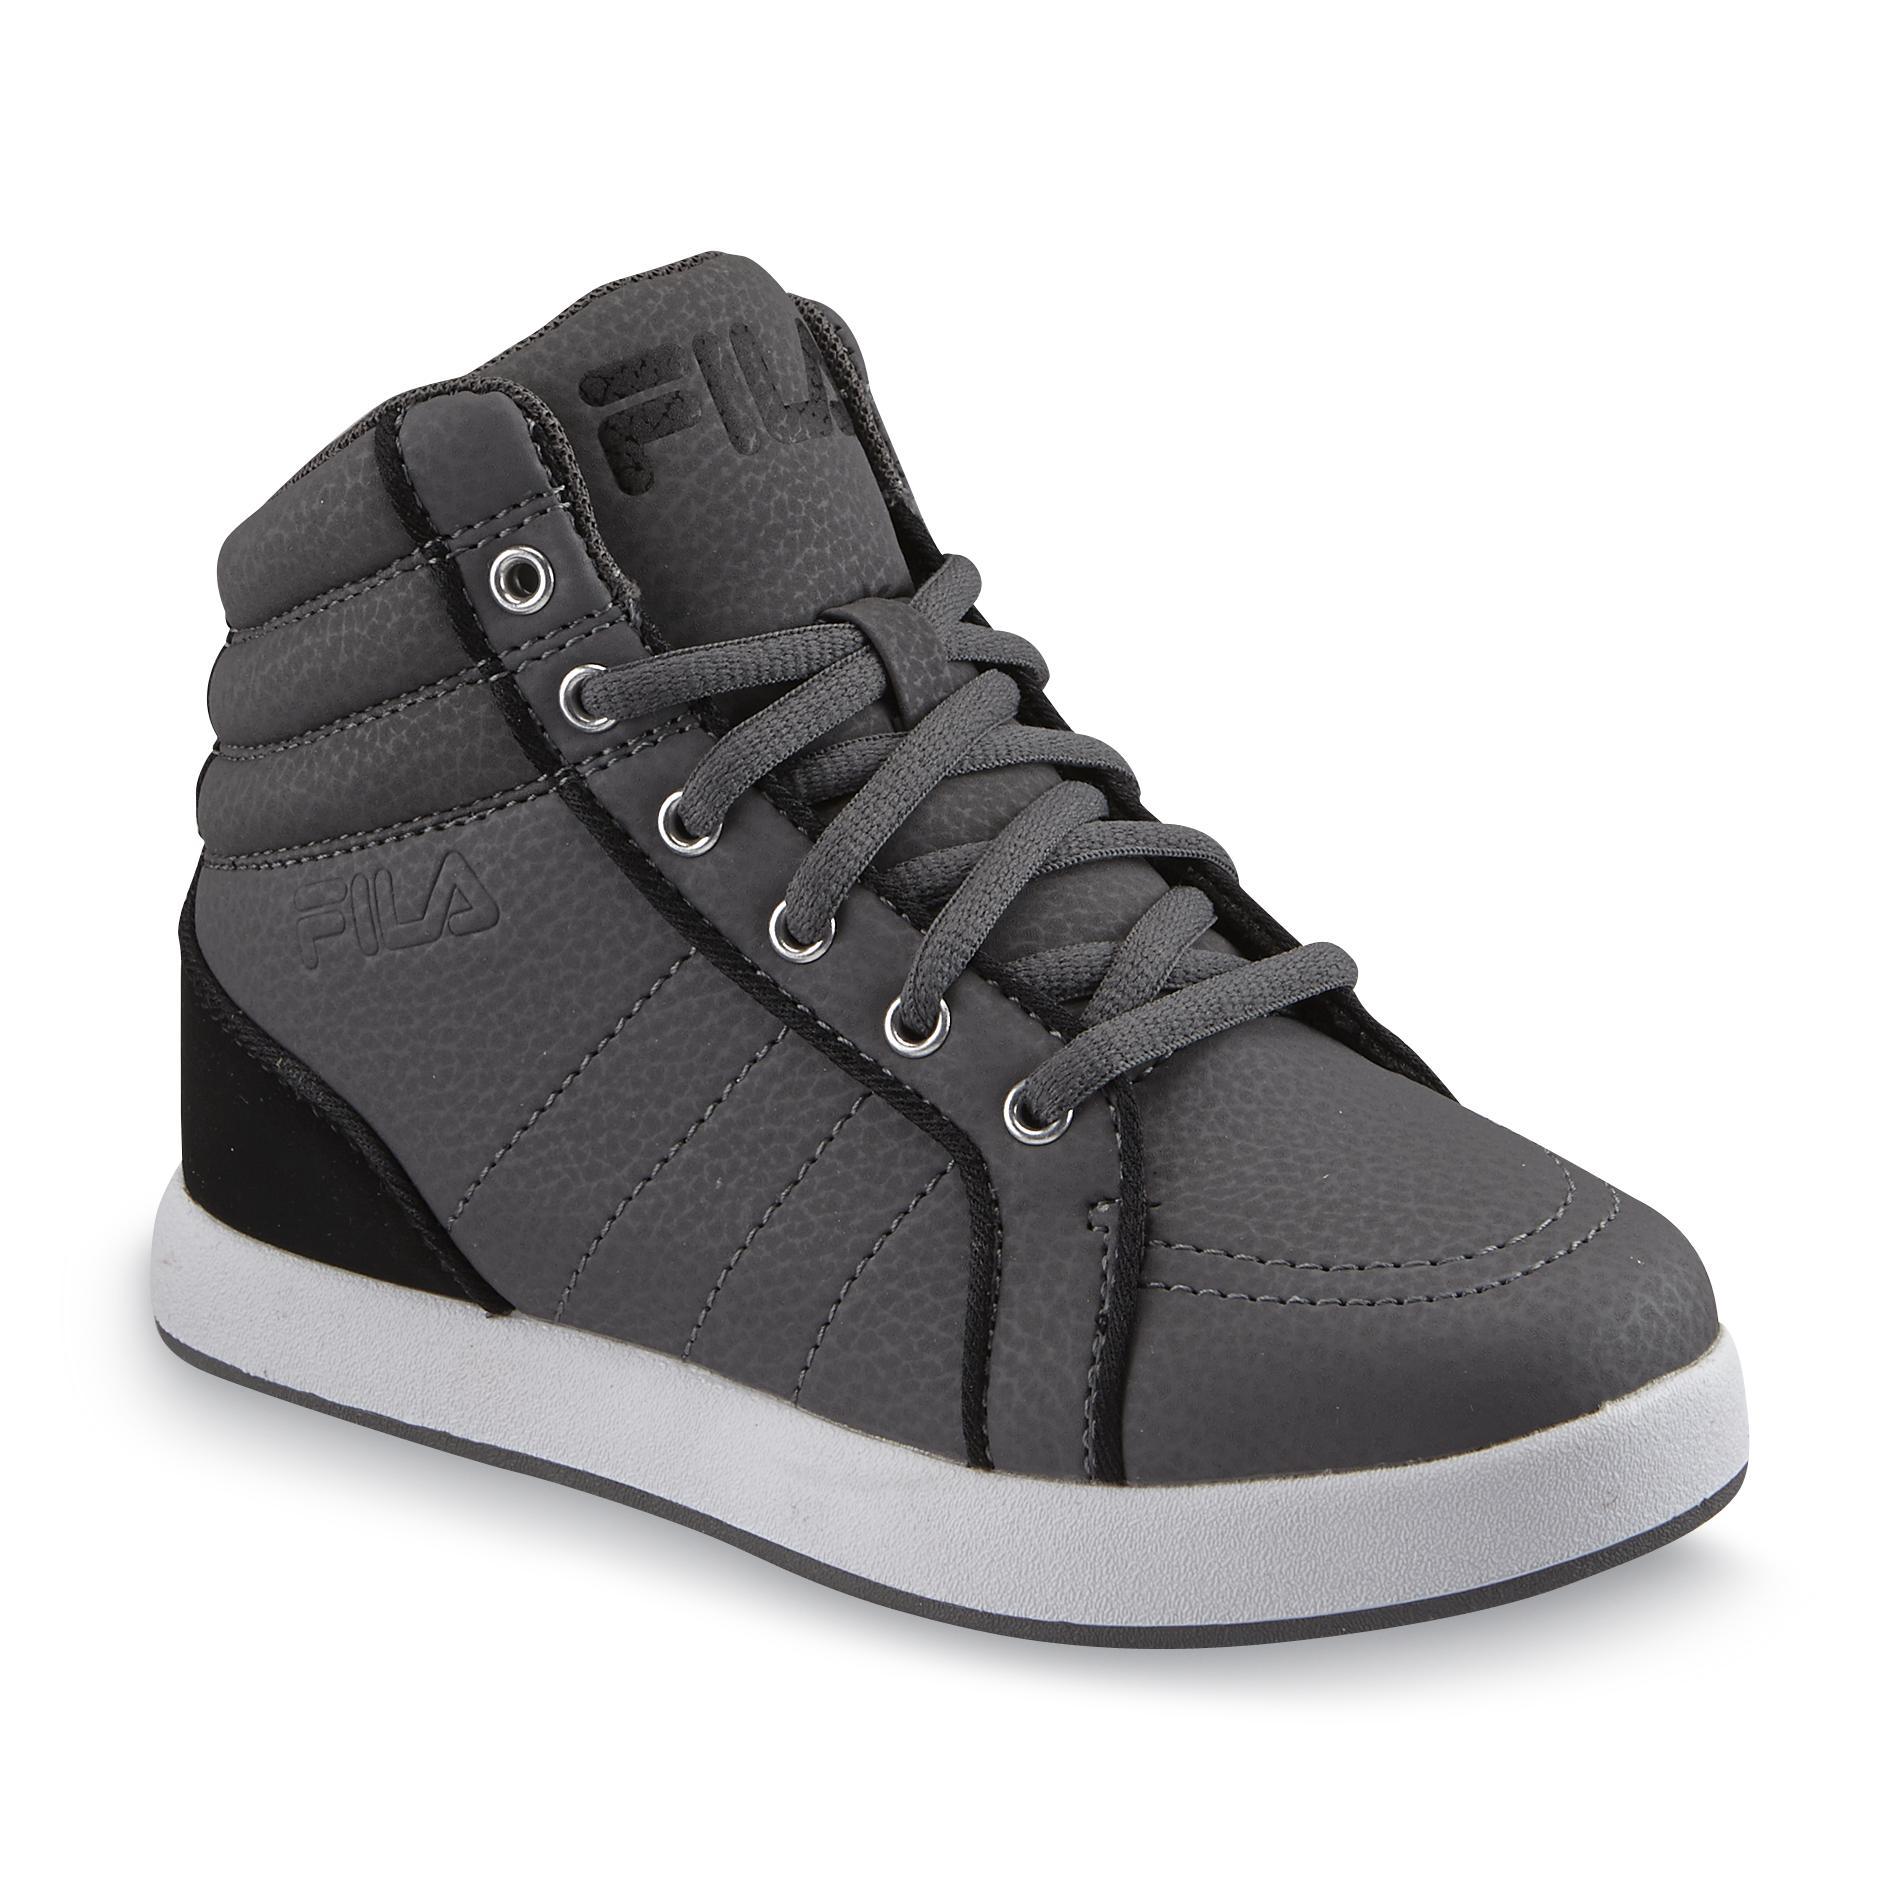 Fila Boy's Calitac Gray/Black High-Top Basketball Shoe